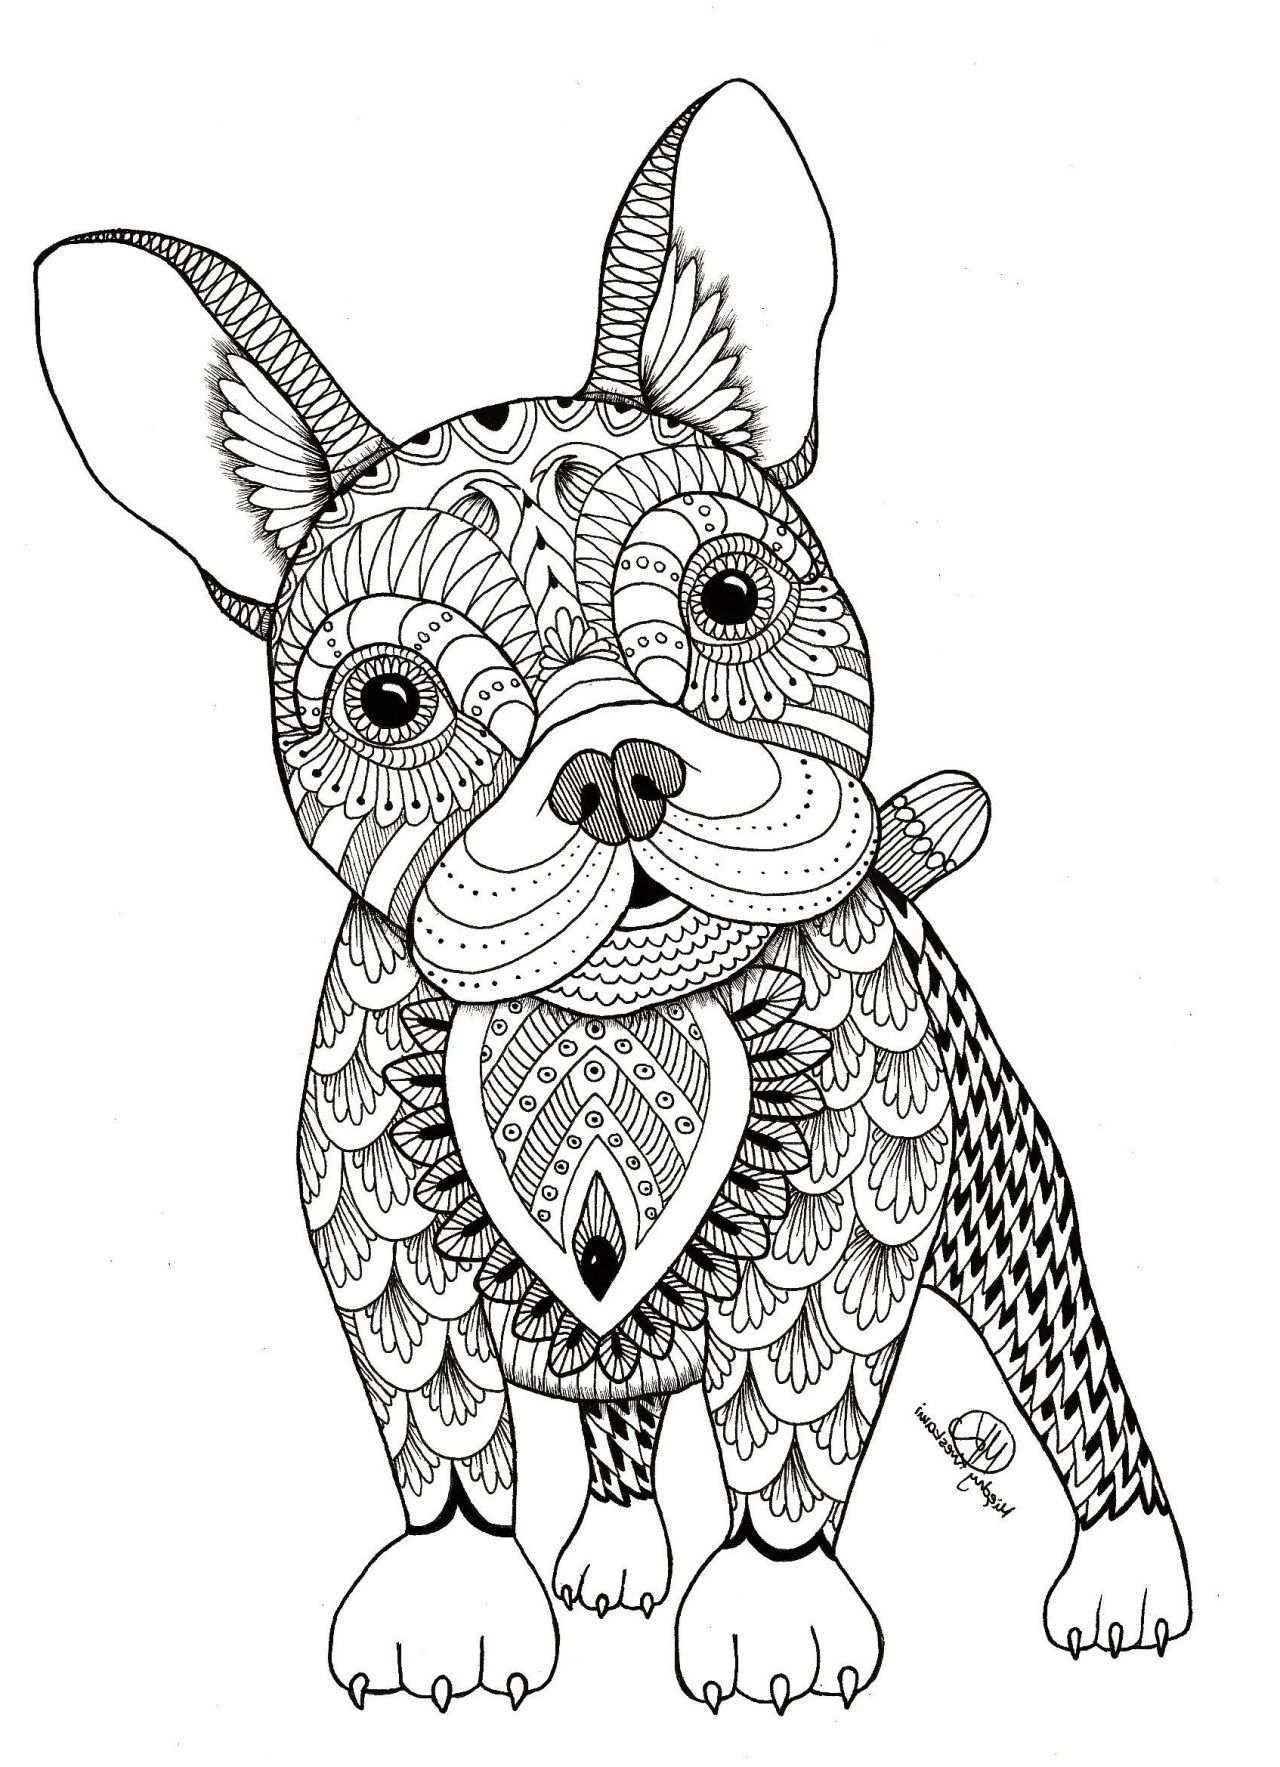 25 Inspiration Image Of Animal Mandala Coloring Pages Entitlementtrap Com Mandala Kleurplaten Dieren Kleurplaten Dierenboek